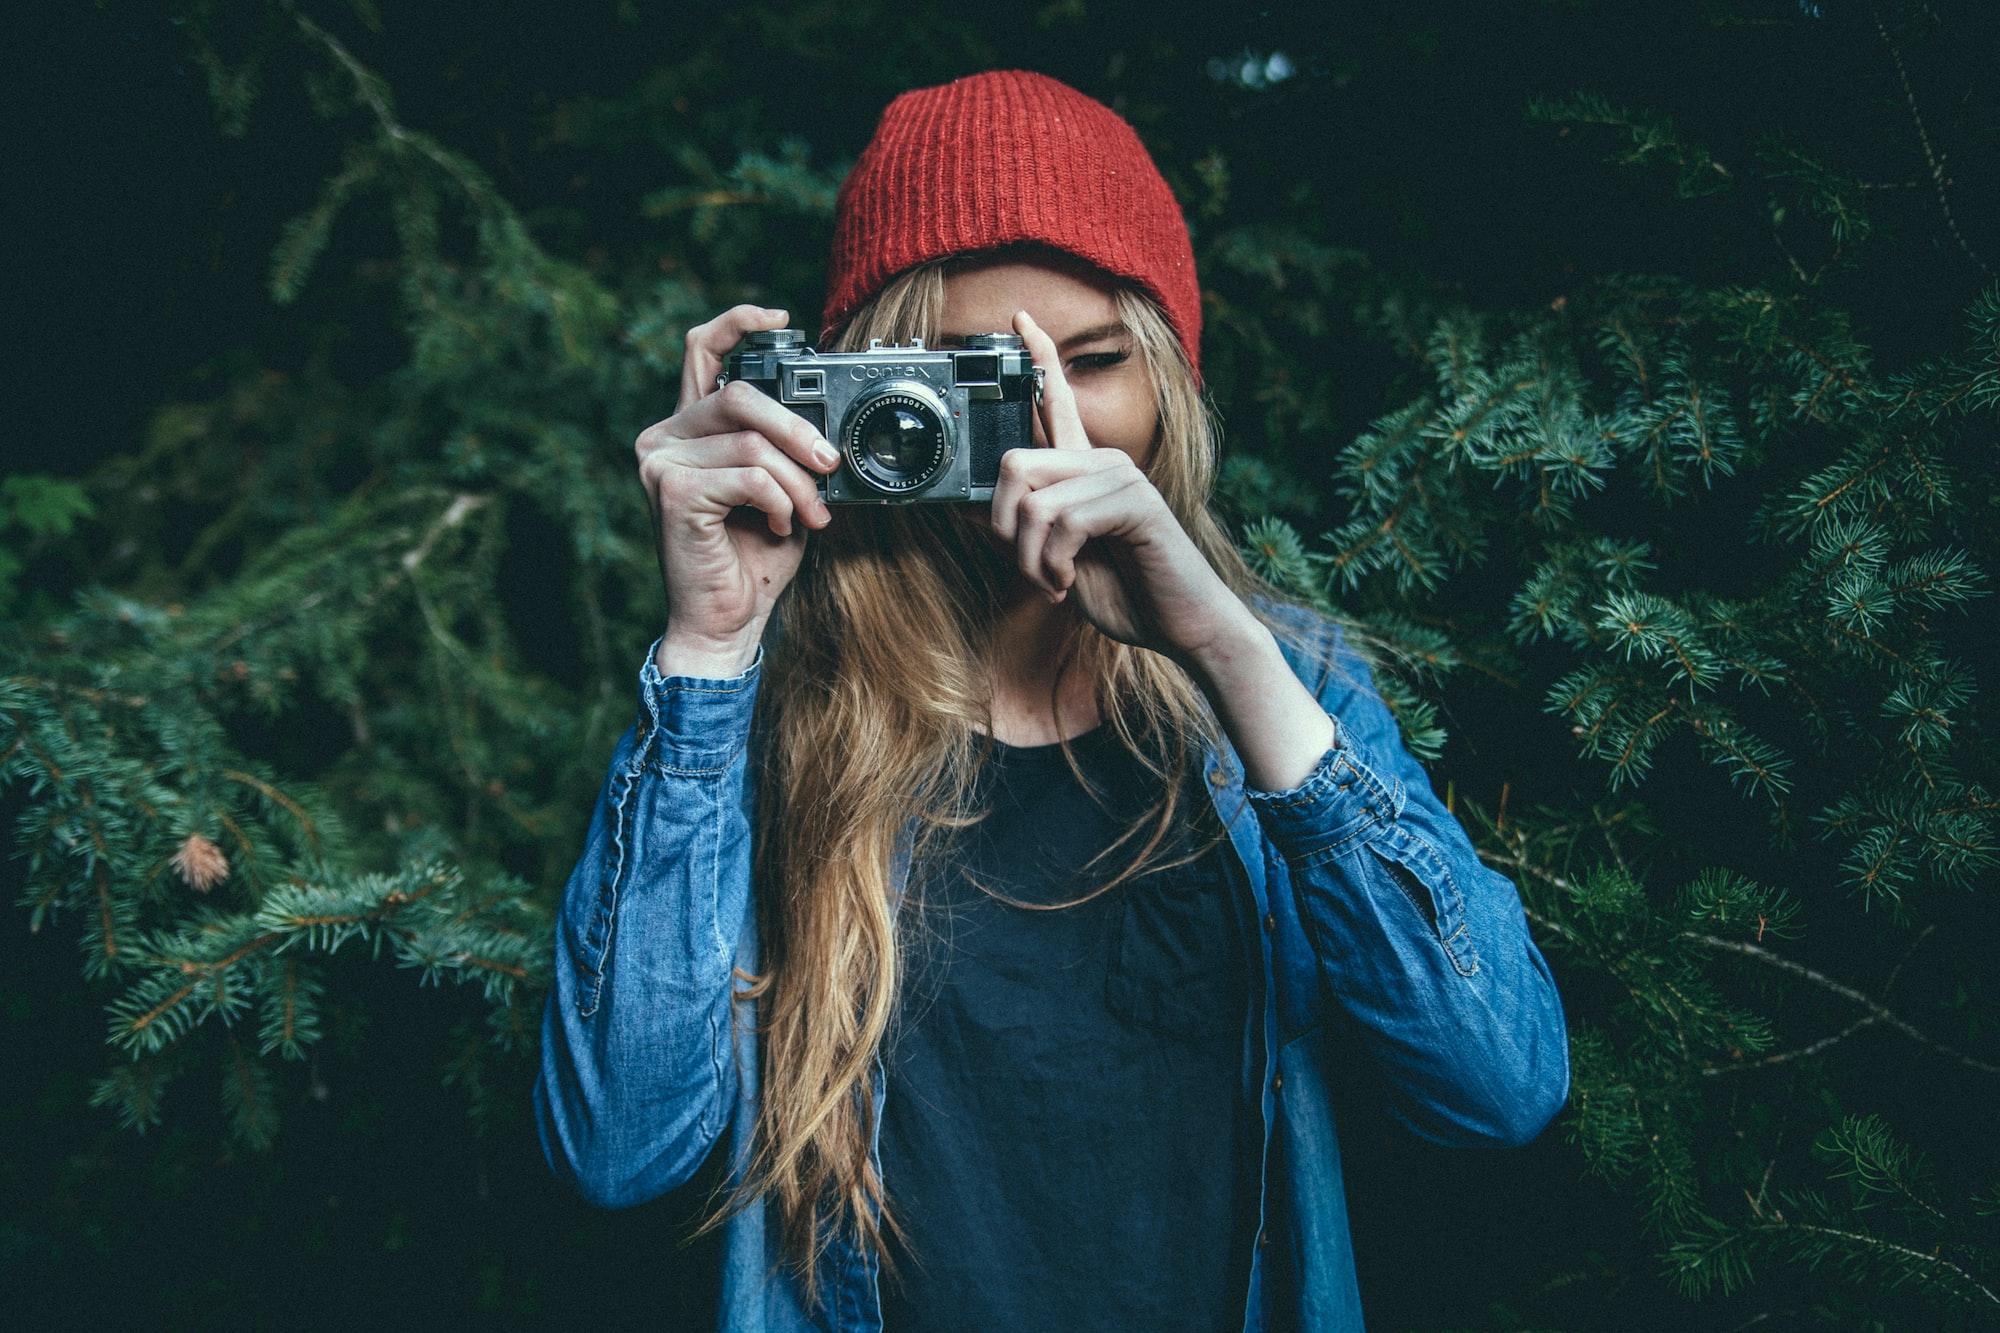 Аватарка для фотографа